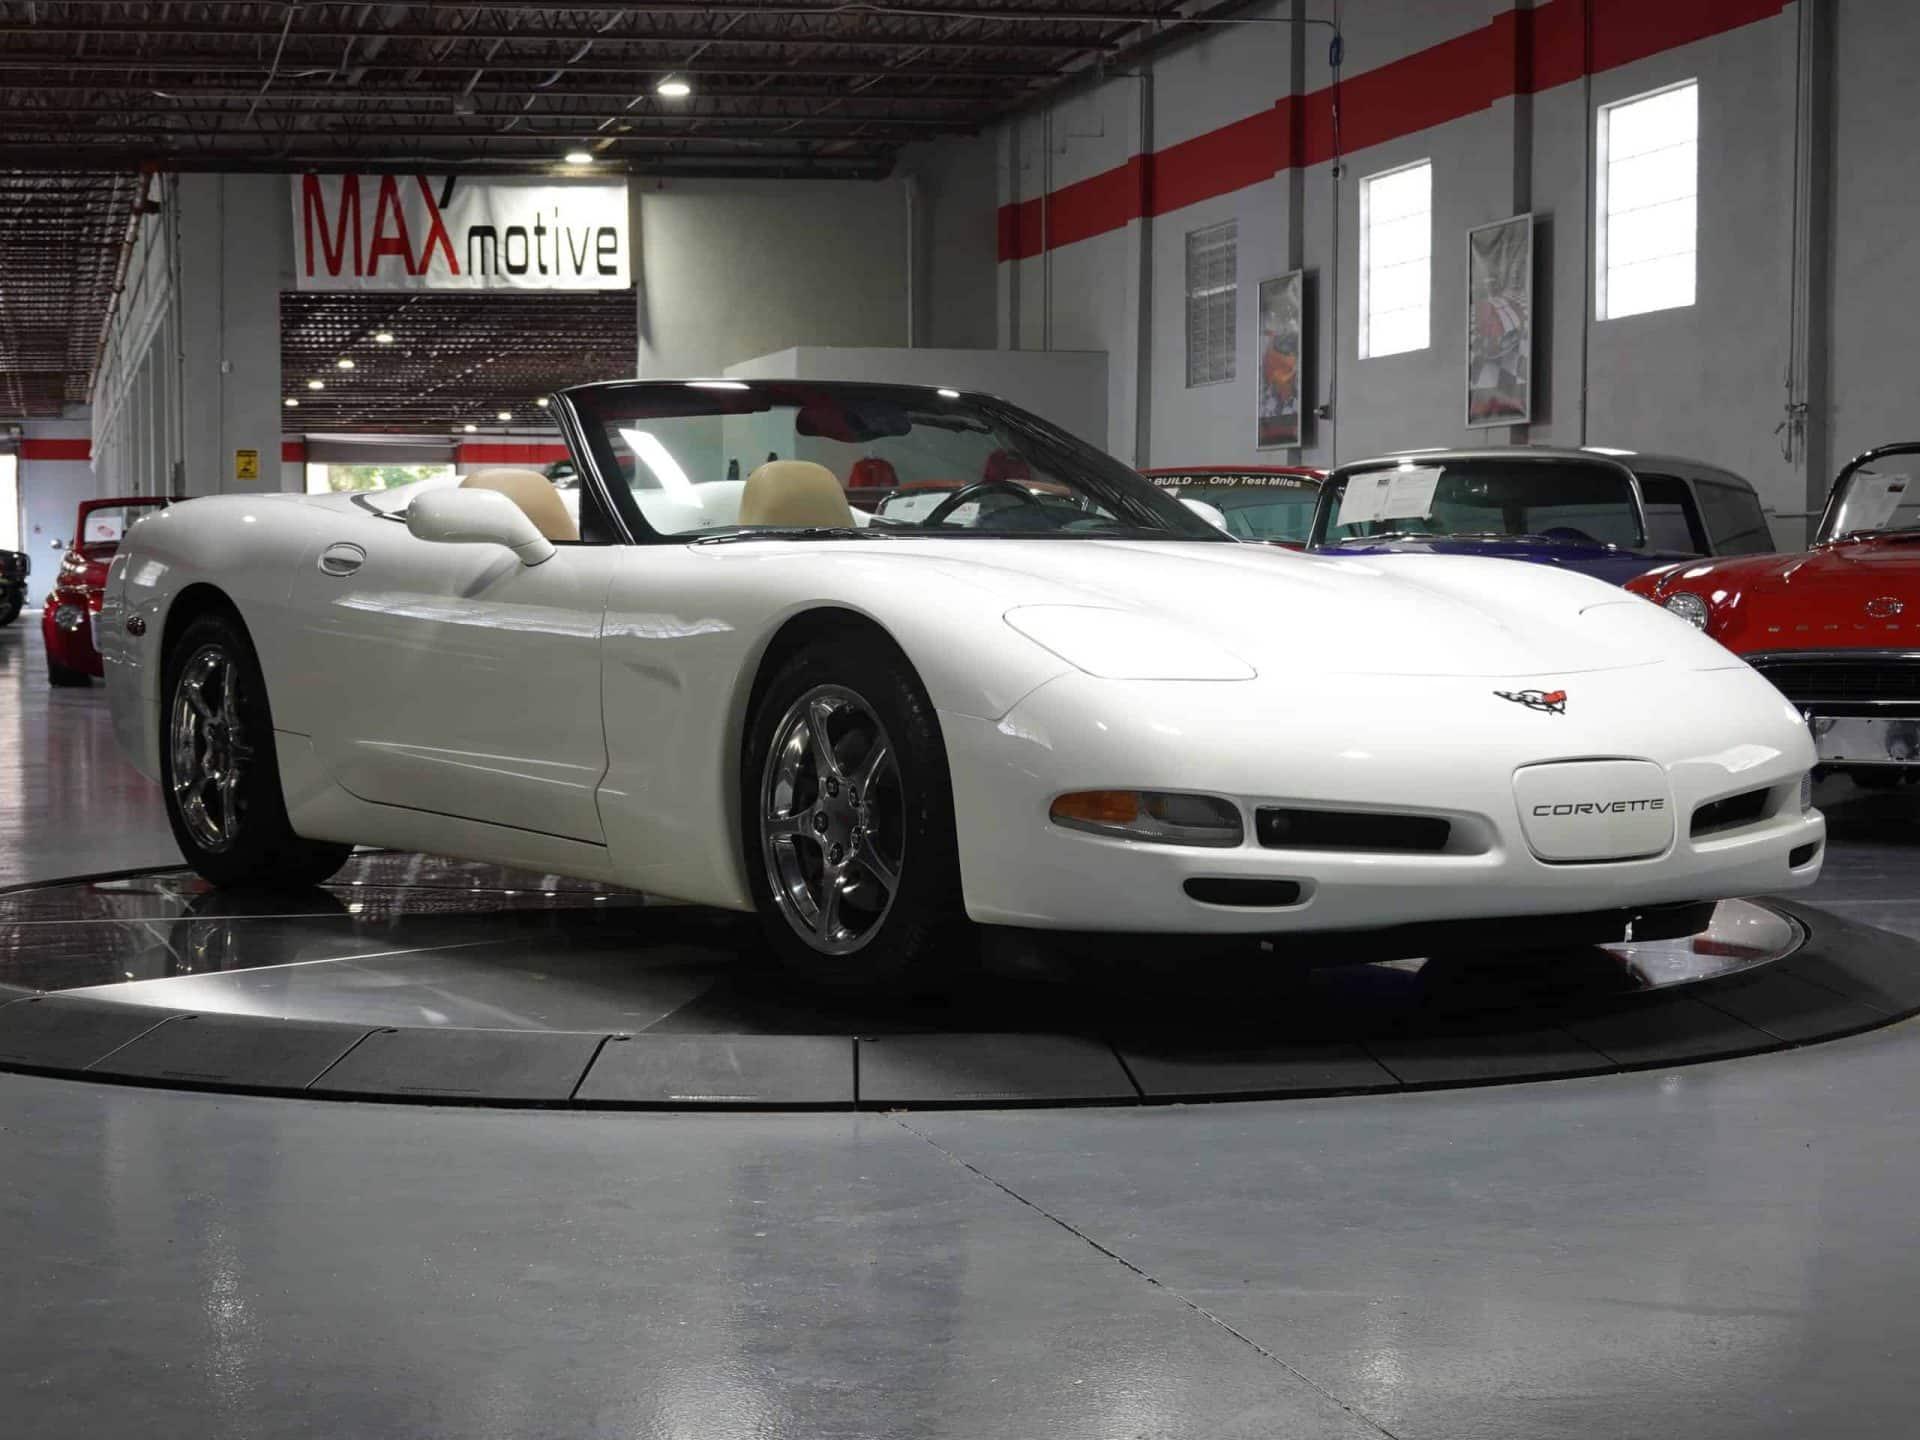 2004 Chevrolet Corvette C5 Convertible - F0658